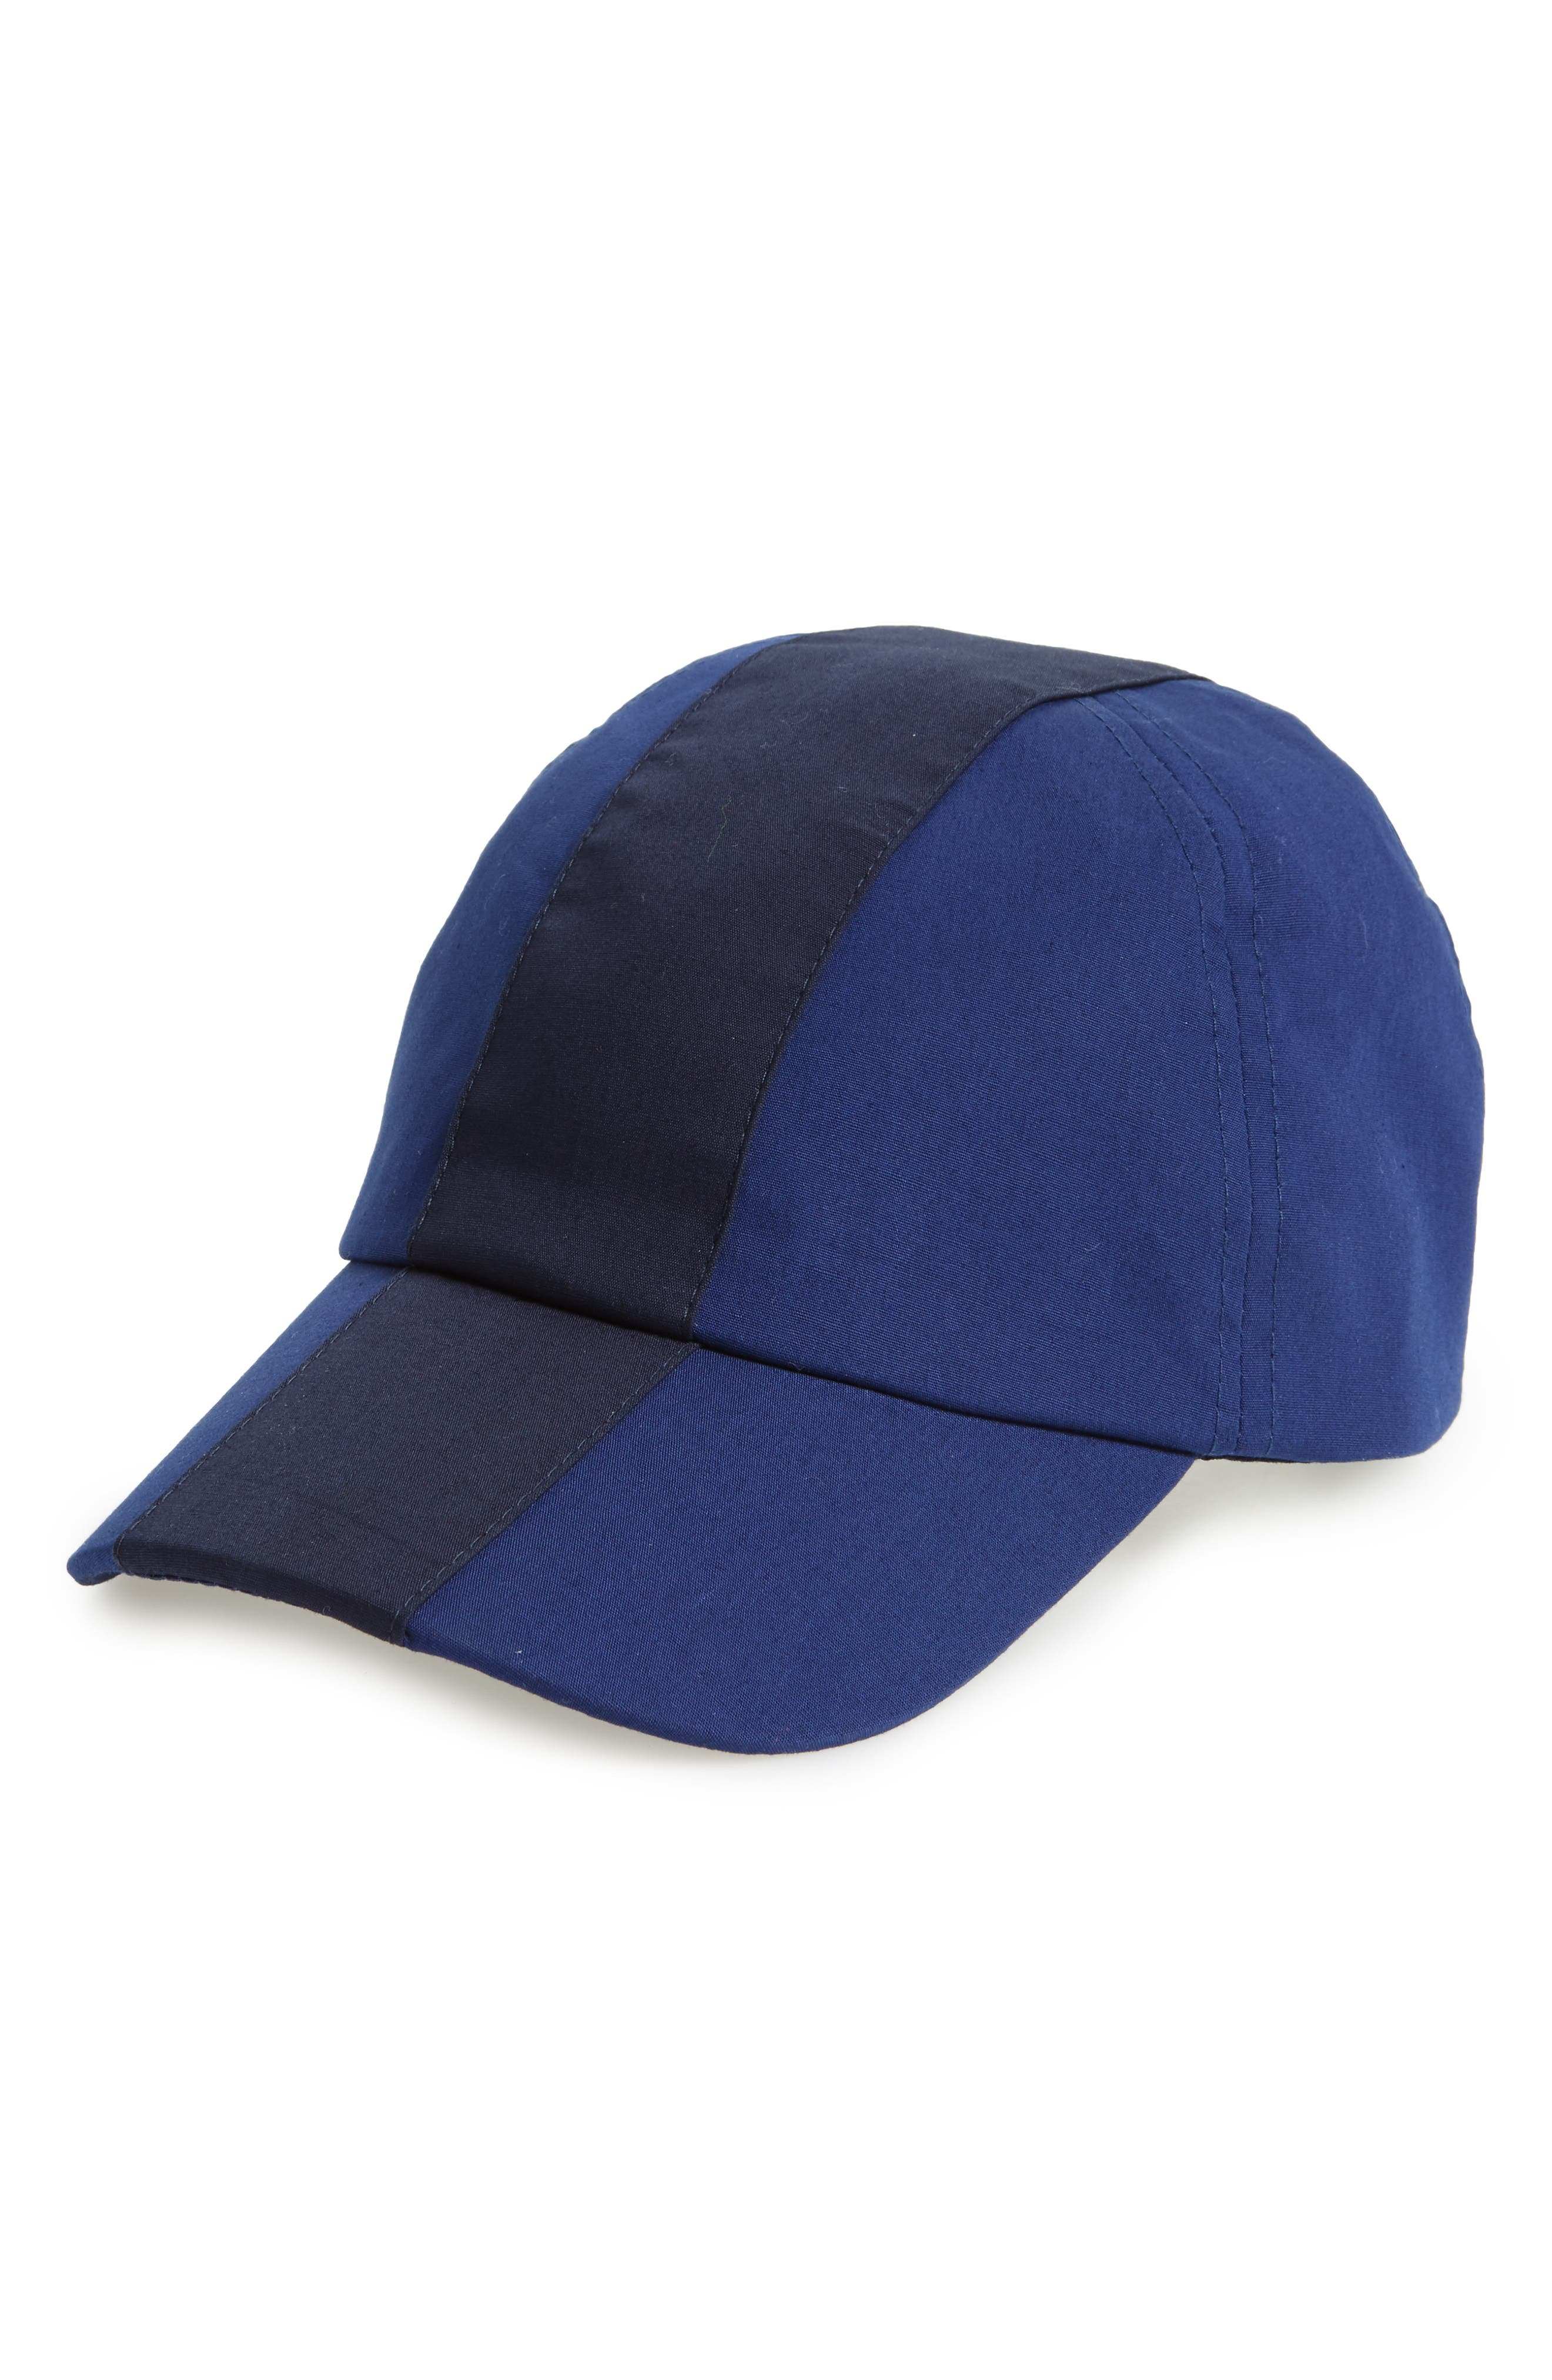 Main Image - Lacoste Colorblock Baseball Cap